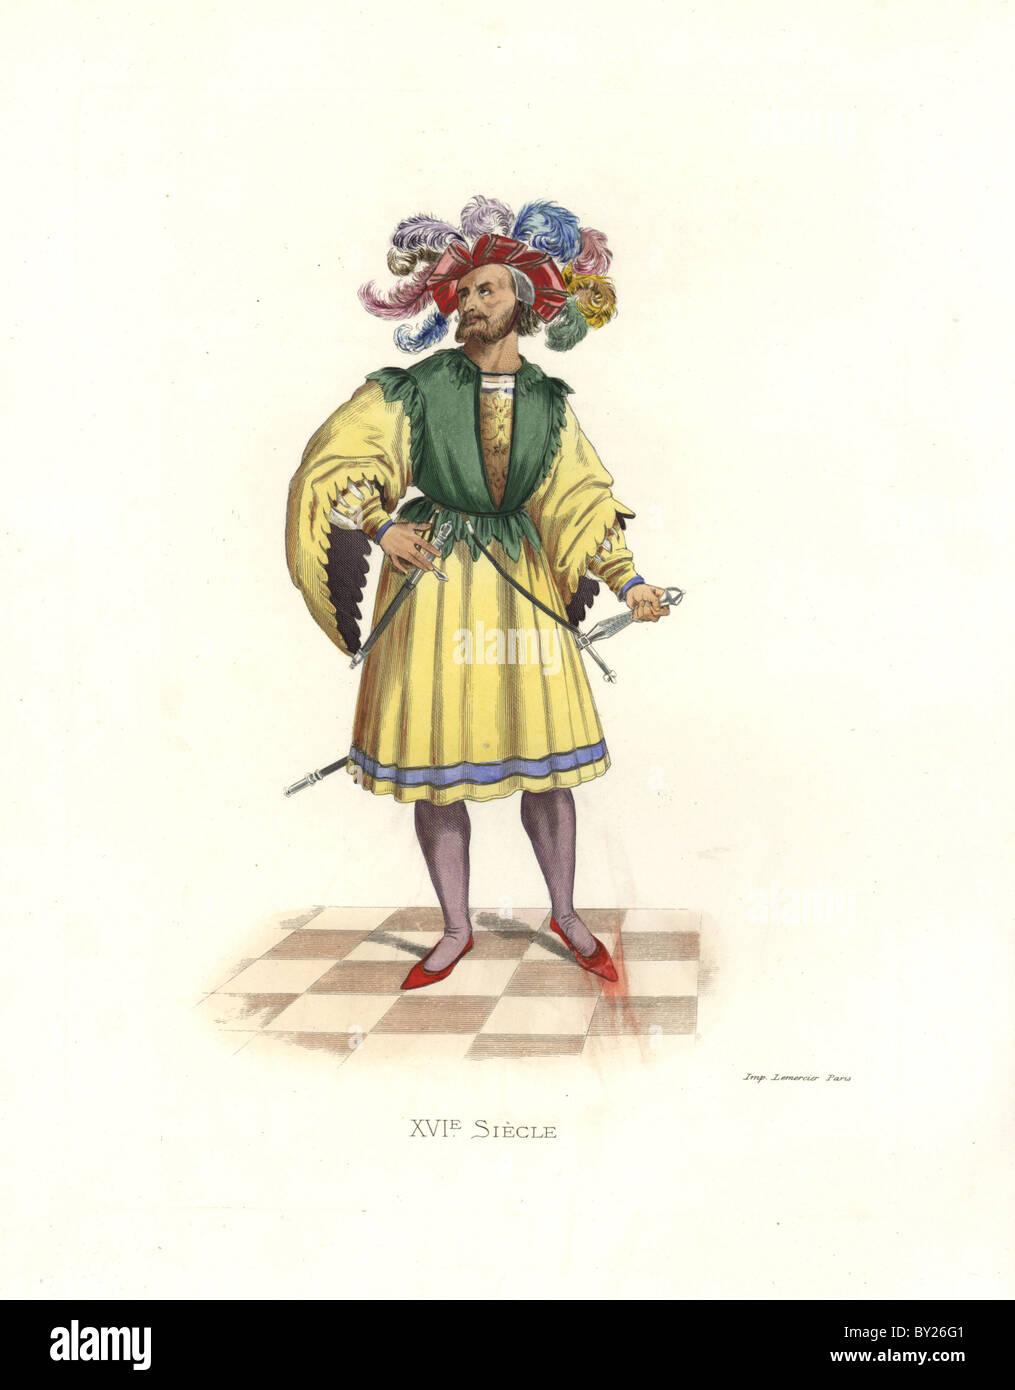 Patrician of Nuremburg, 16th century. - Stock Image